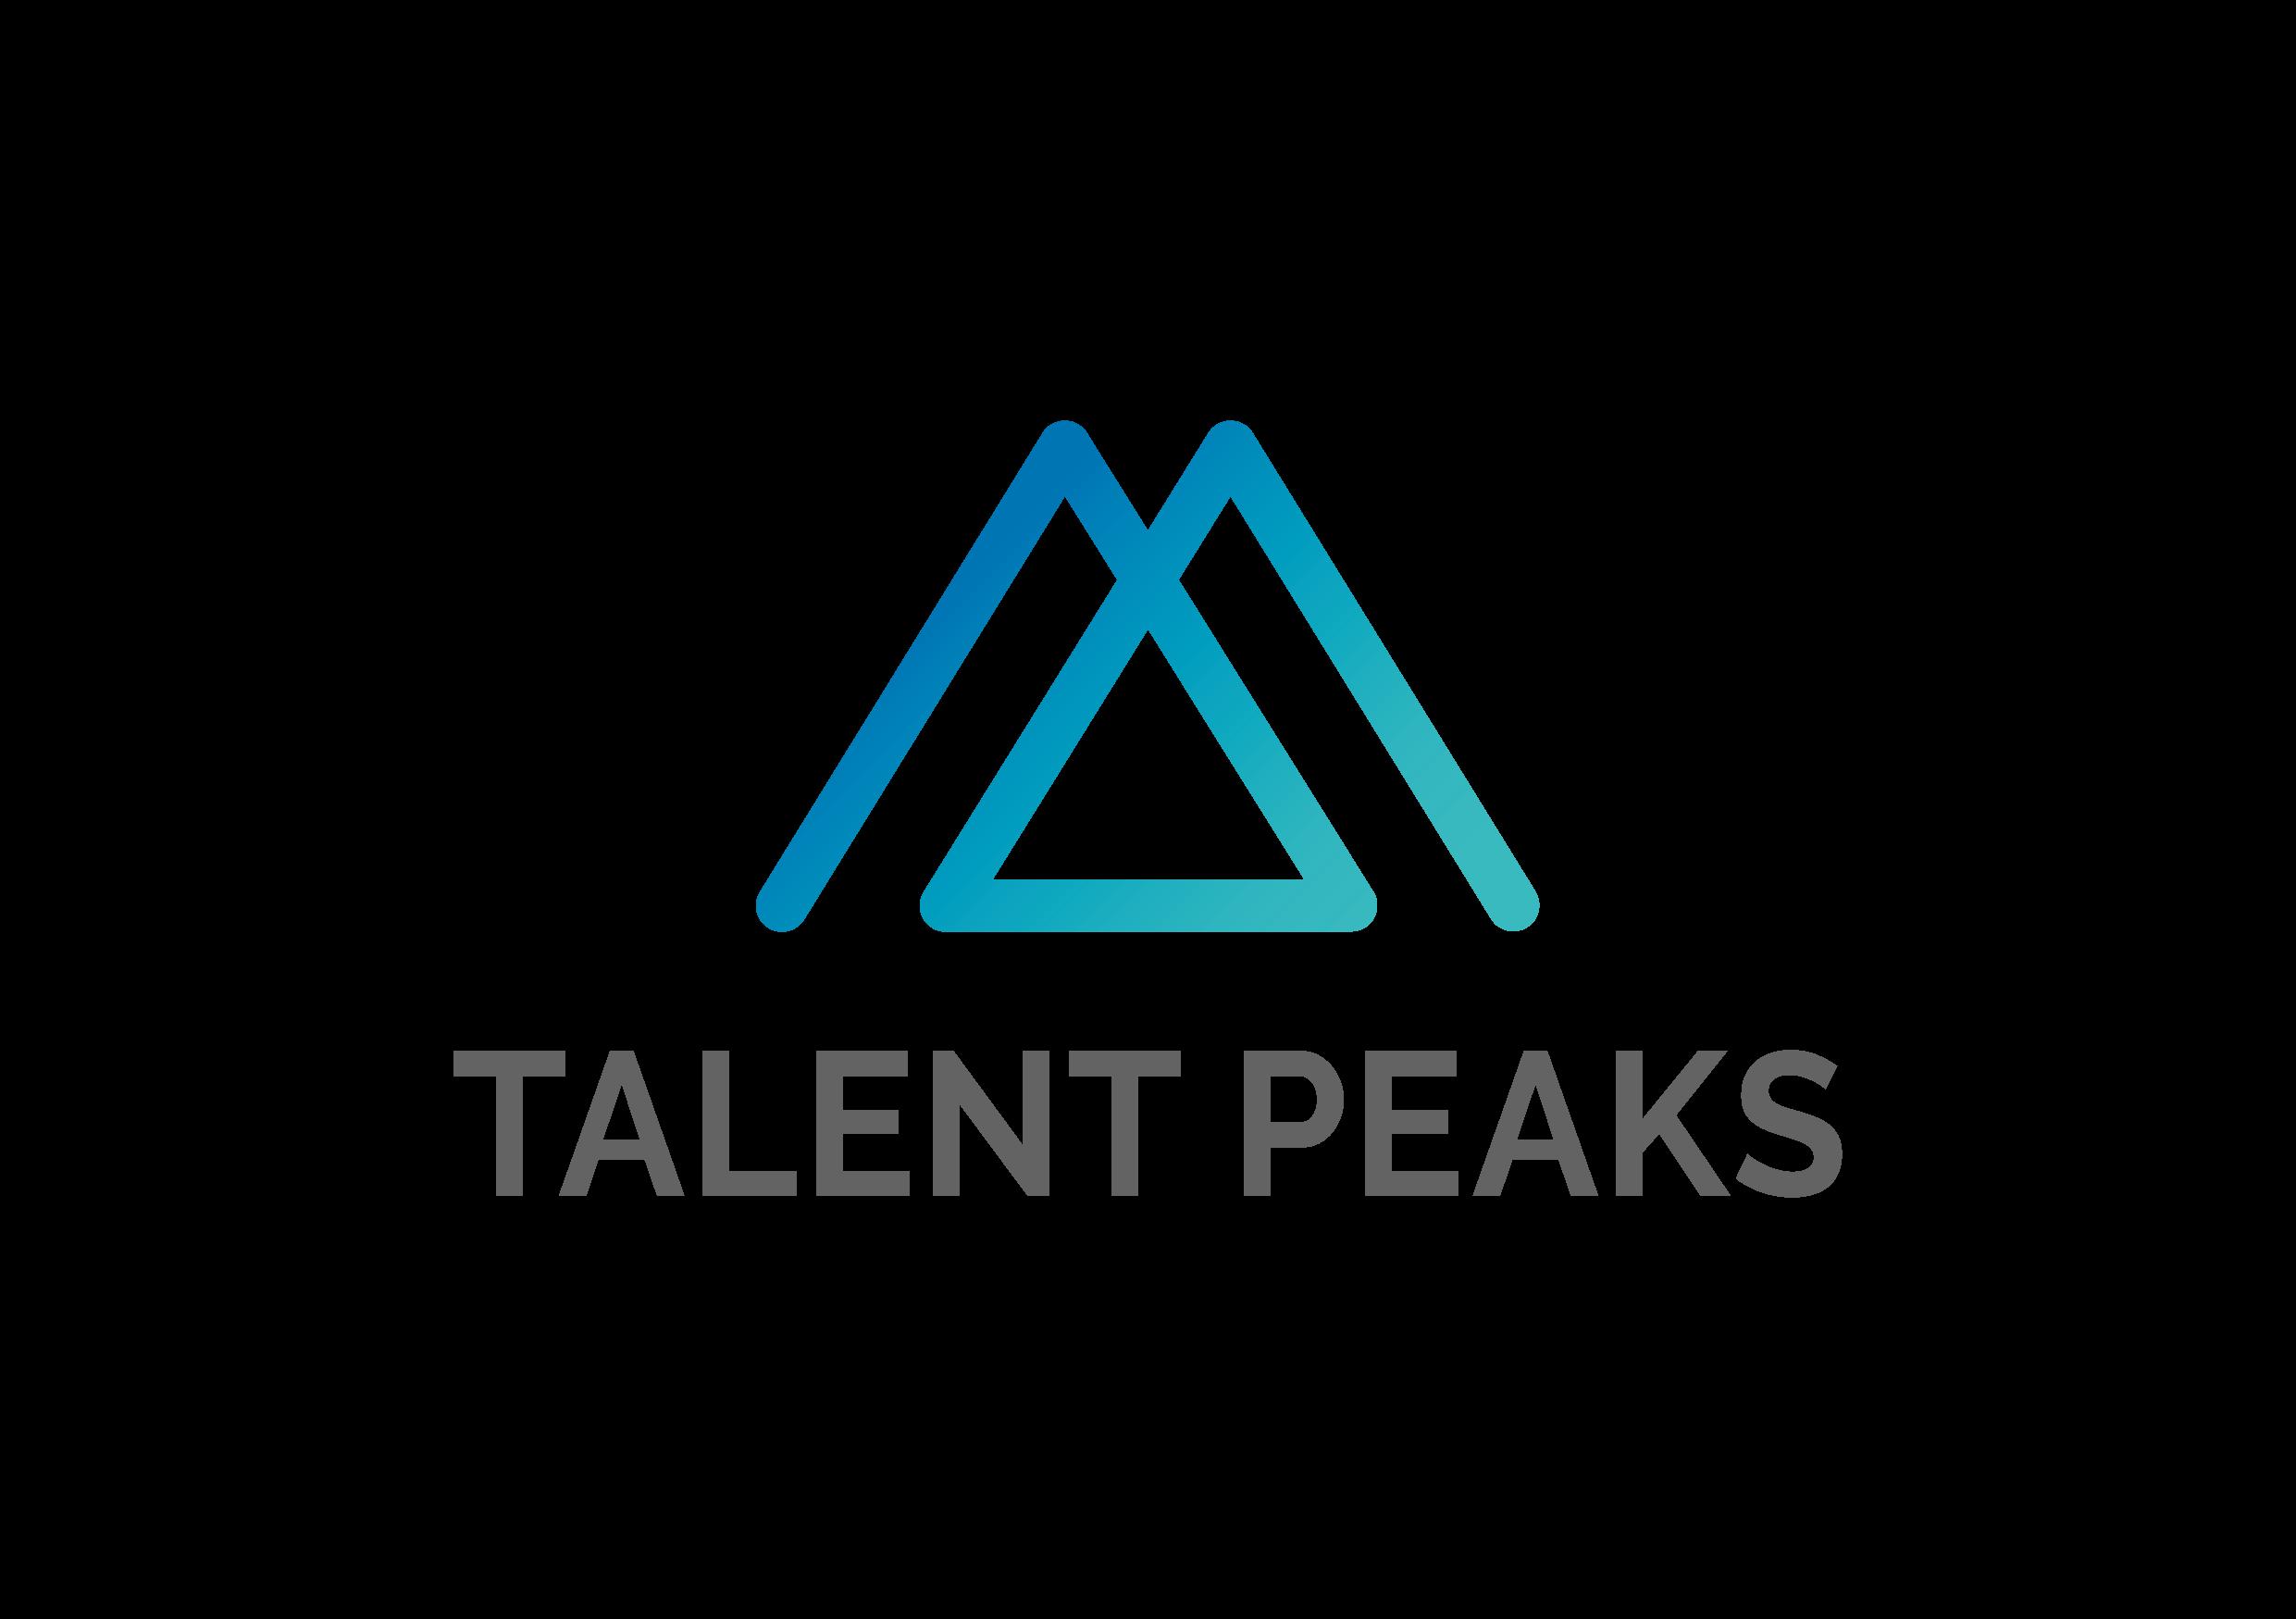 Talent Peaks - JobRoad